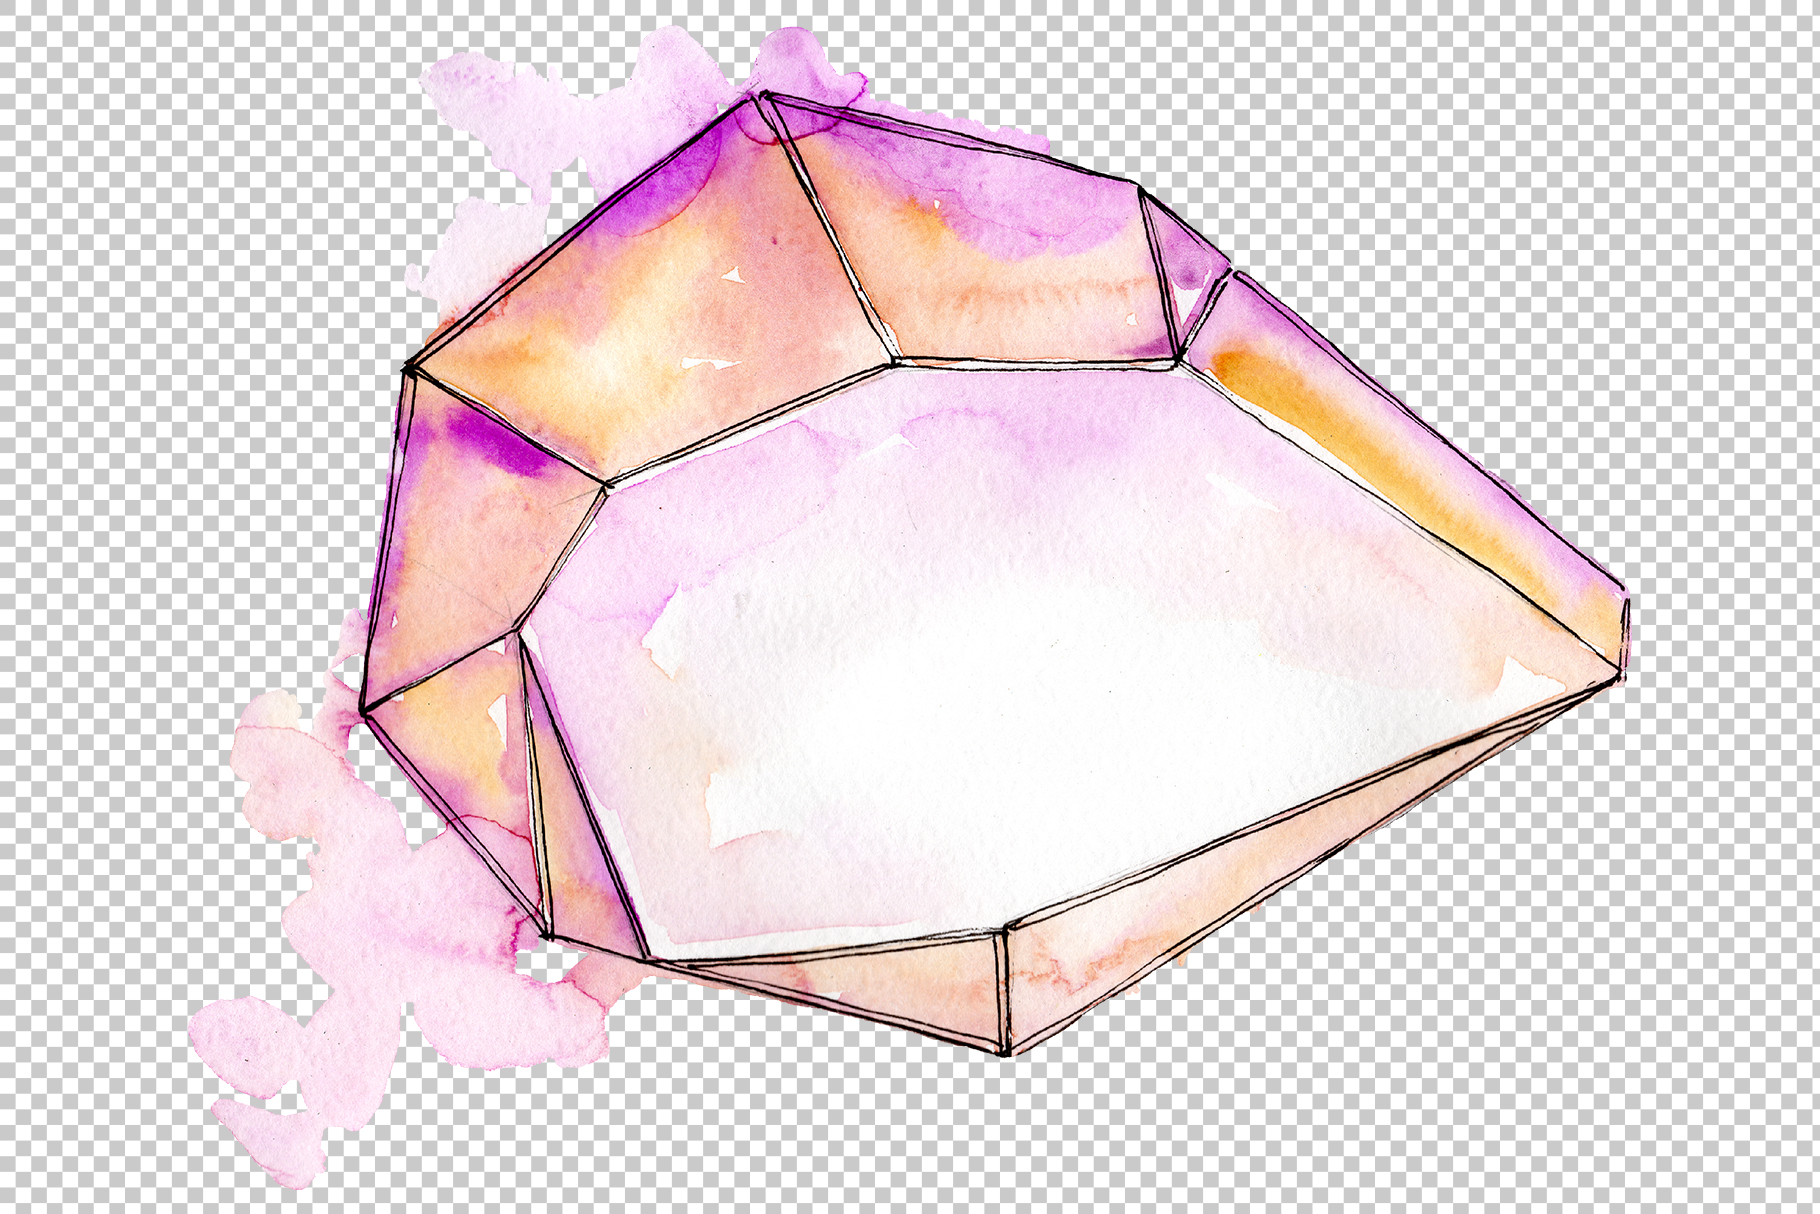 Aquamarine crystals Watercolor png example image 4